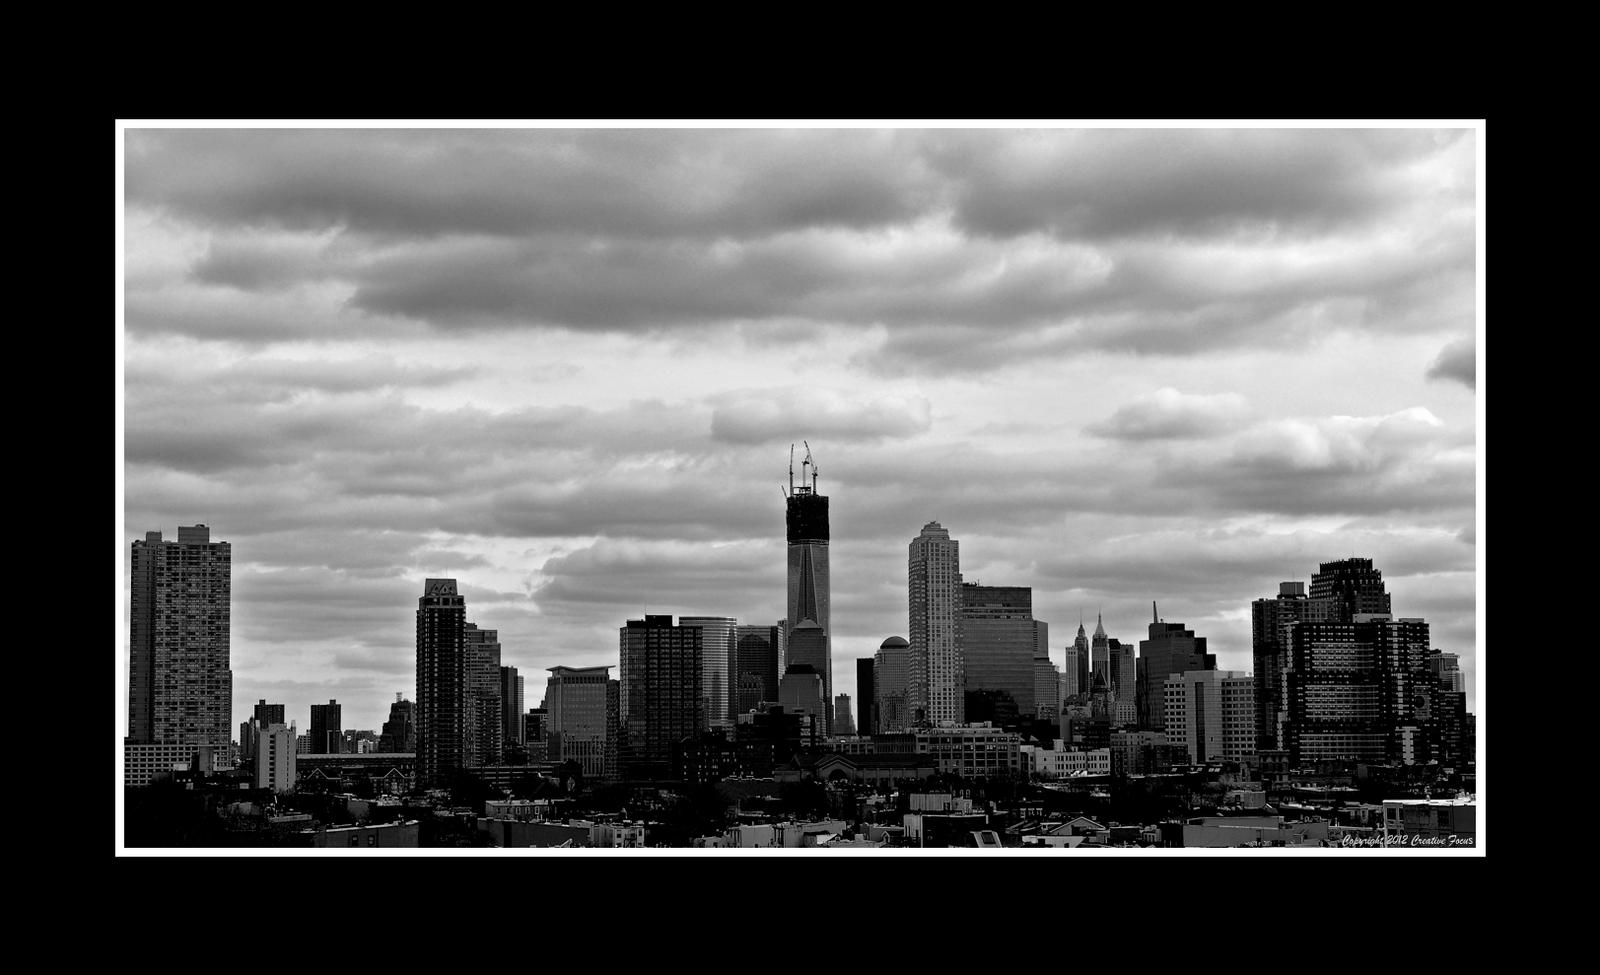 December City by Trippy4U